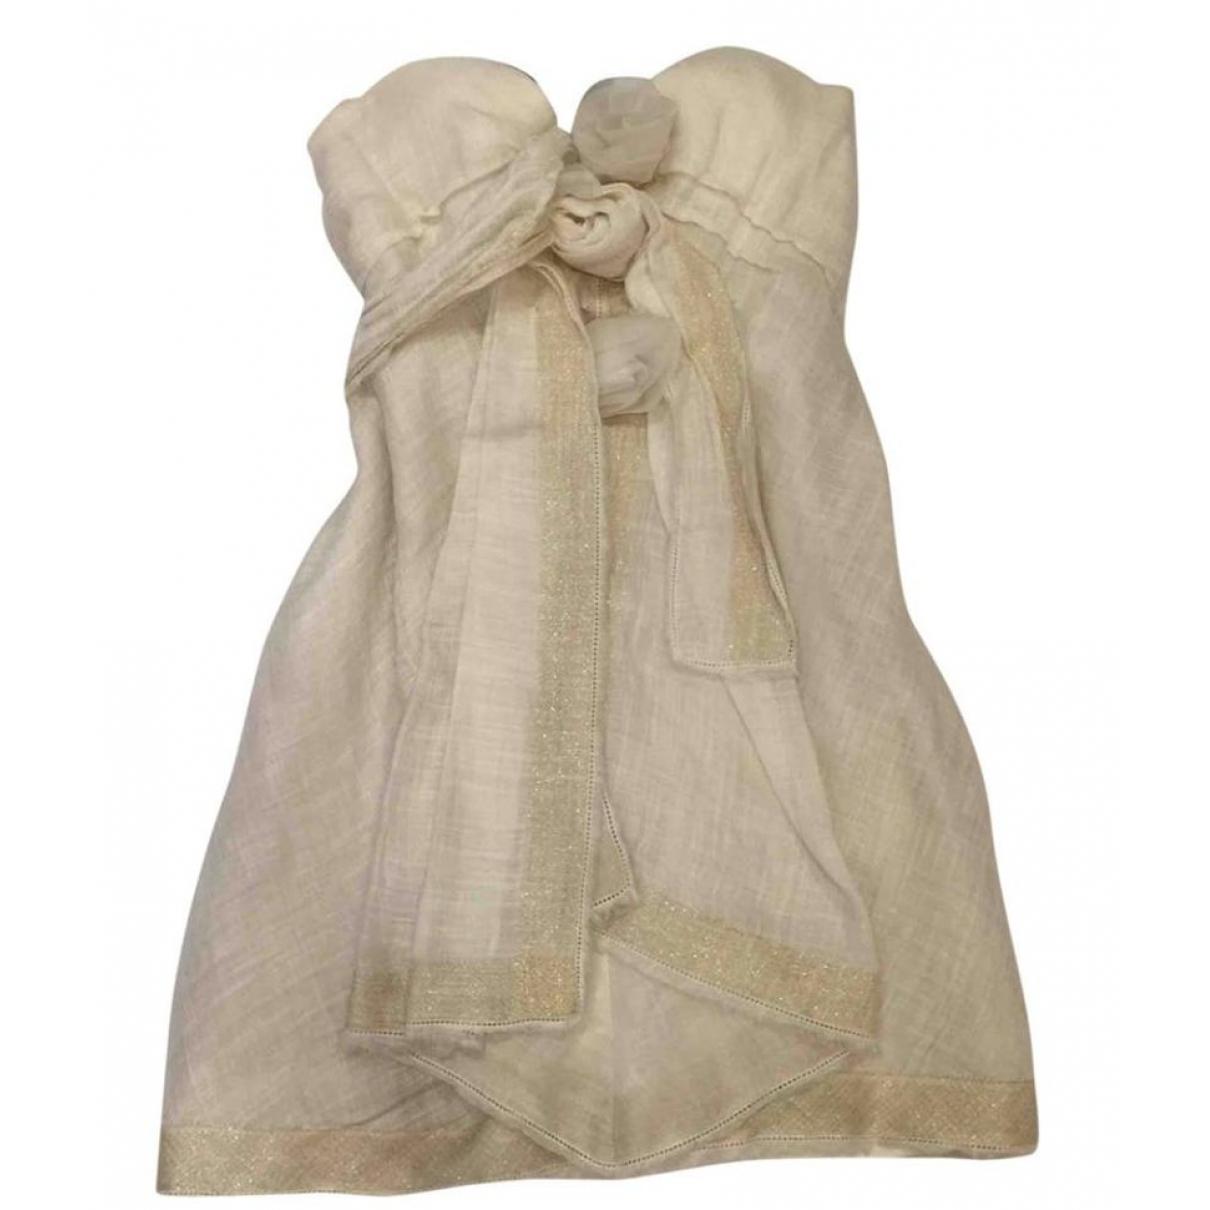 Ermanno Scervino \N Beige Linen dress for Women 40 IT